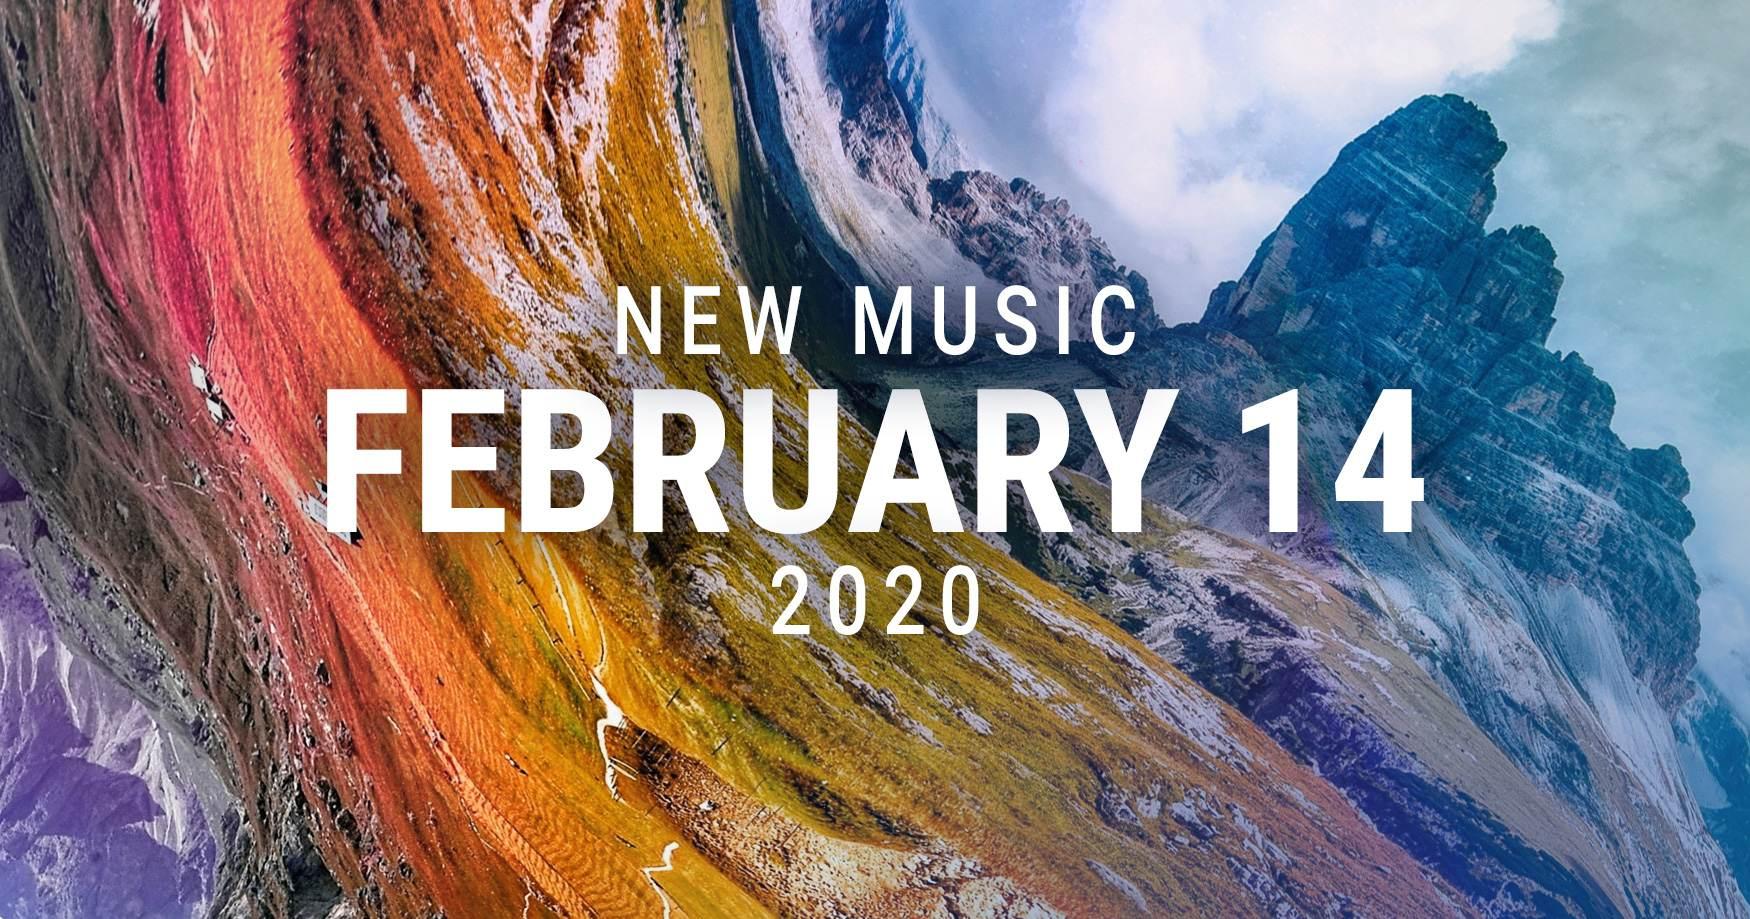 New Music February 14 2020